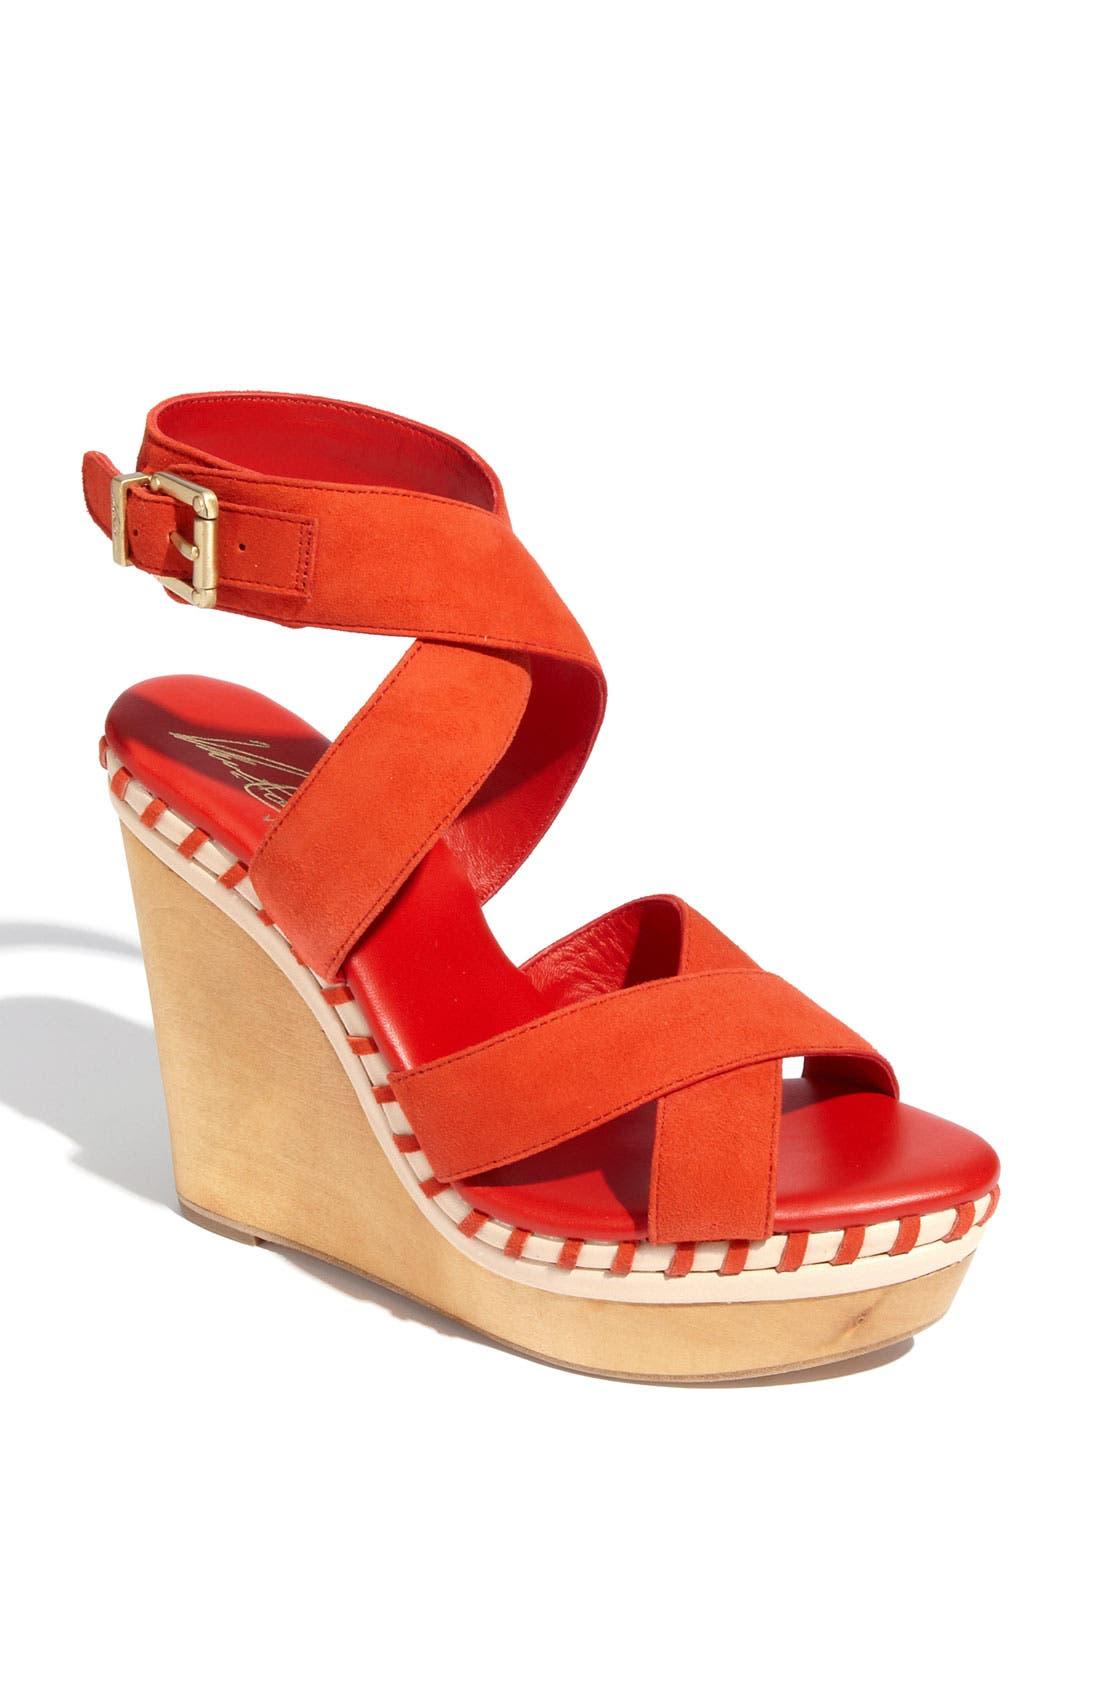 Alternate Image 1 Selected - VC Signature 'Lene' Sandal (Exclusive)